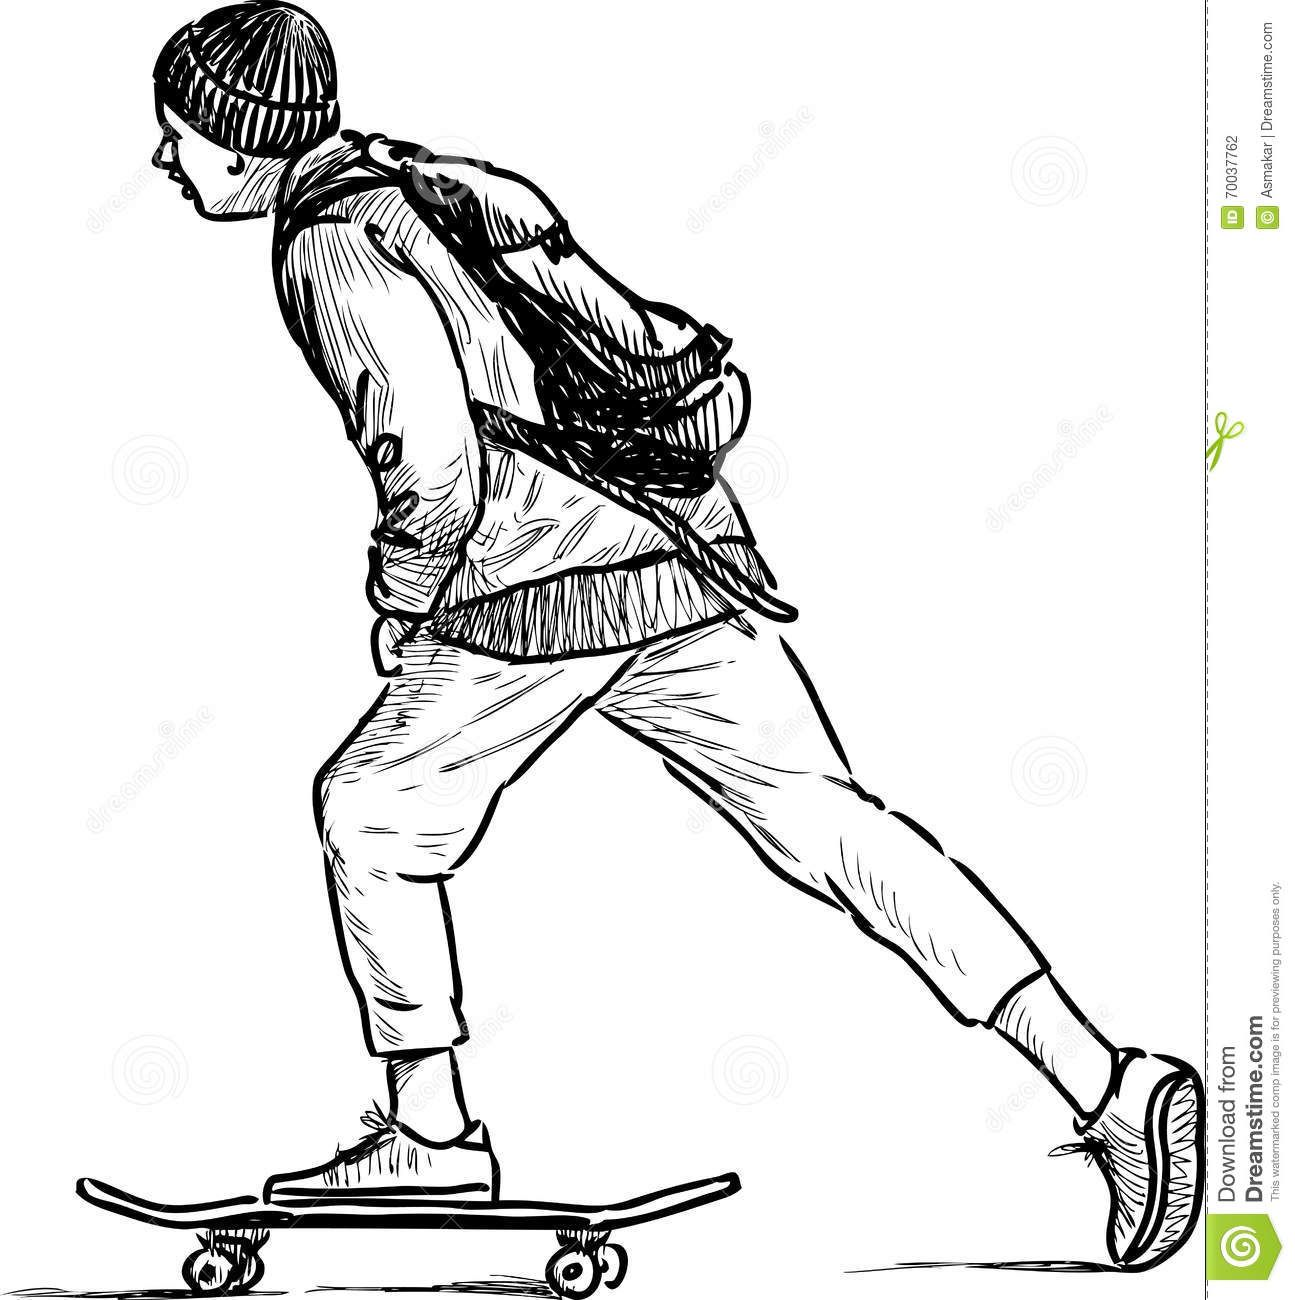 Skateboard Drawing